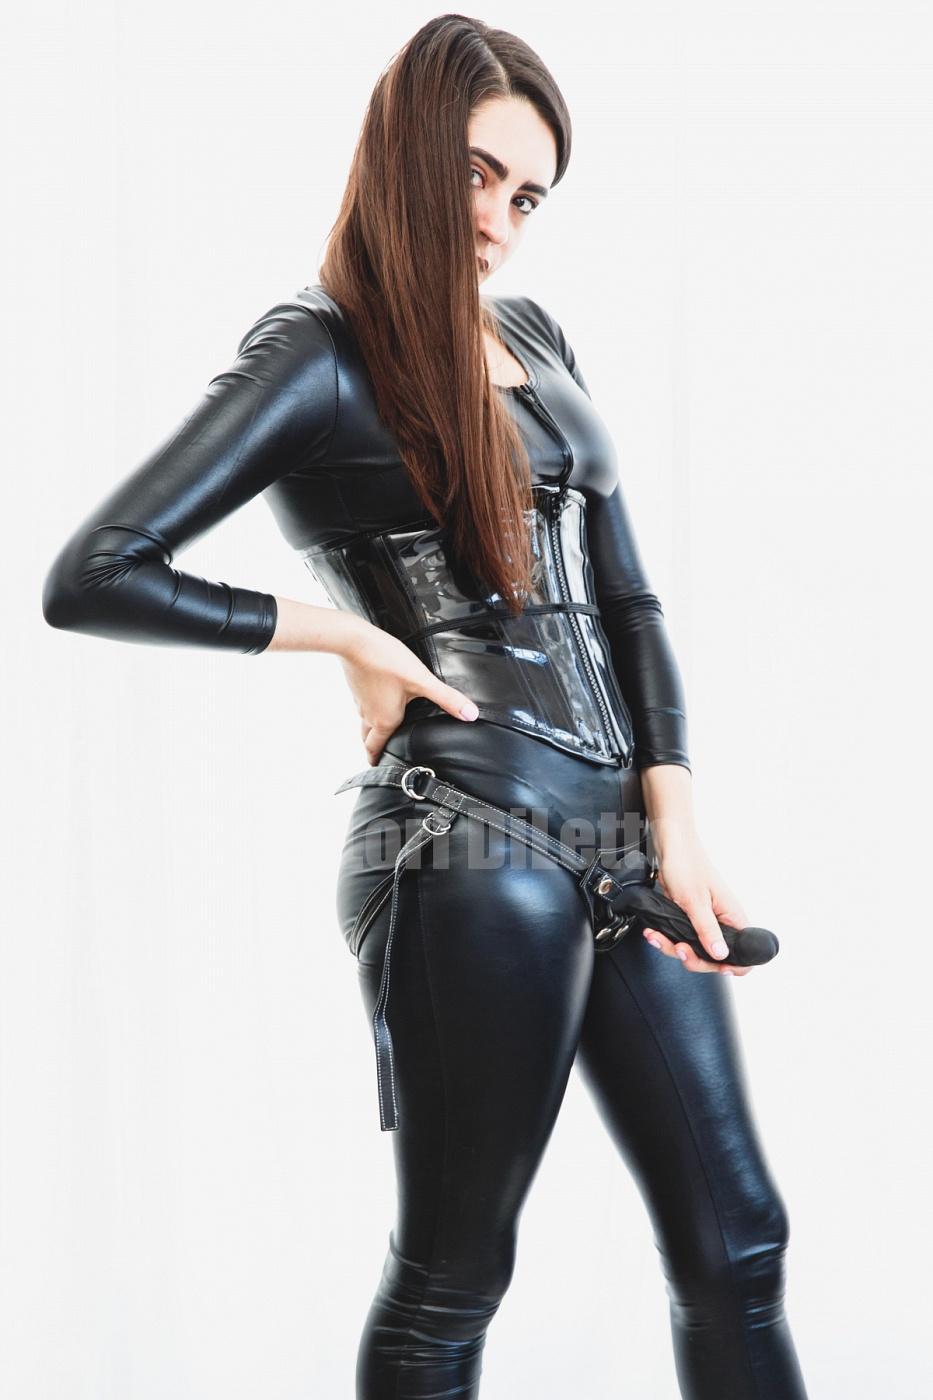 Mistress Lori DiLetto